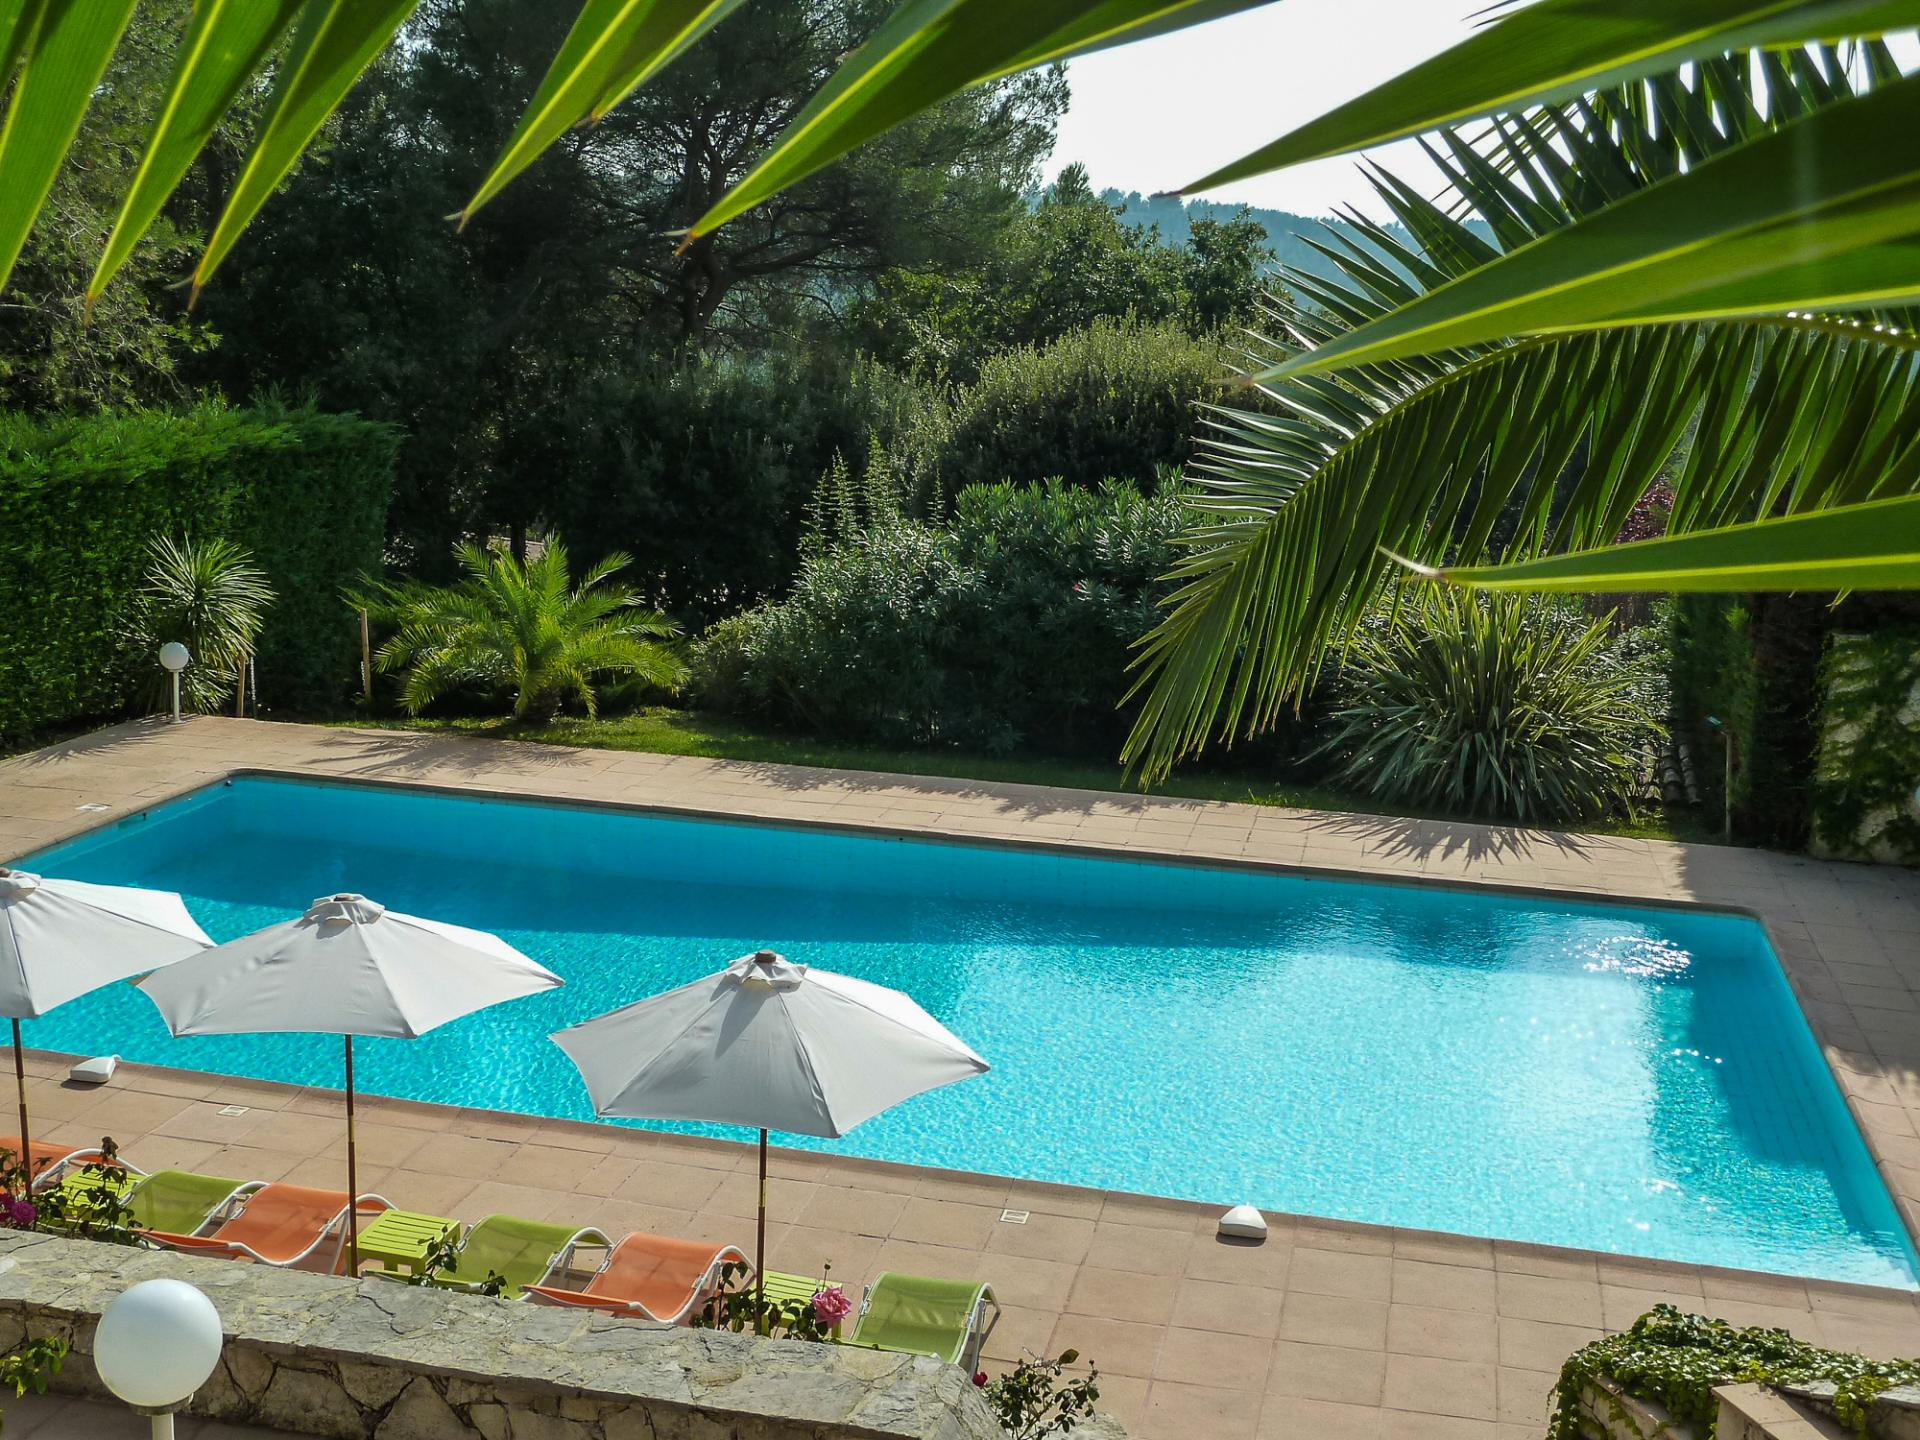 villa in Biot on the cote d'azur